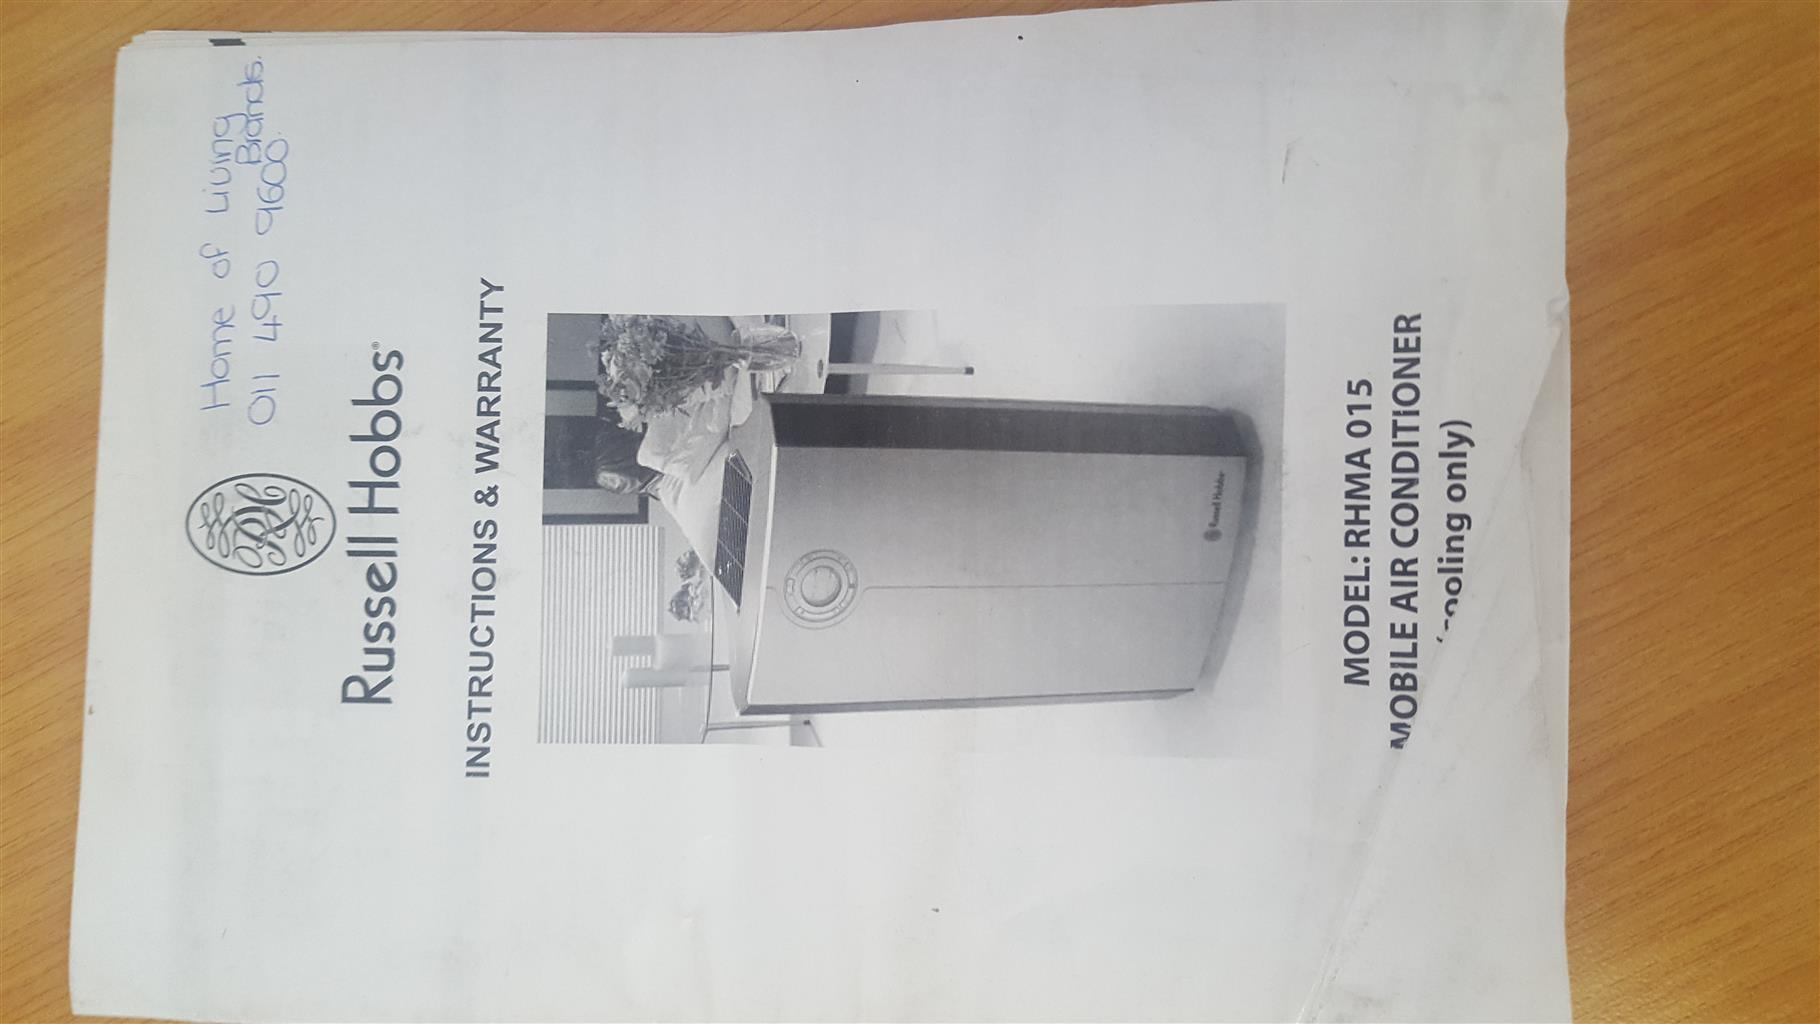 Russel Hobbs mobile air conditioner RHMA 015